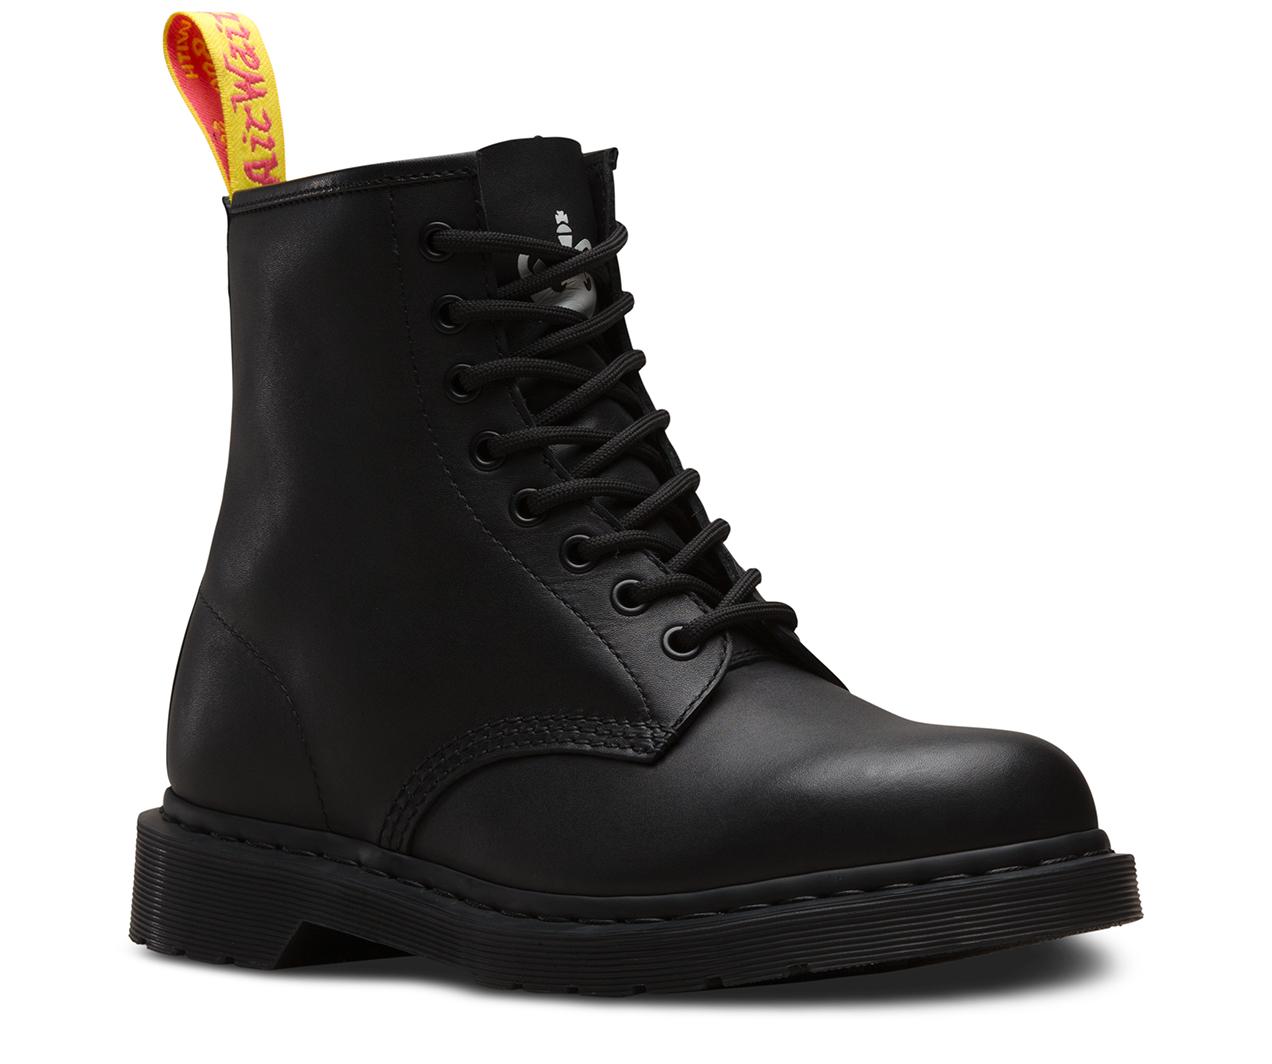 1460 Sex Pistols No Future Boots Dr Martens Official Site